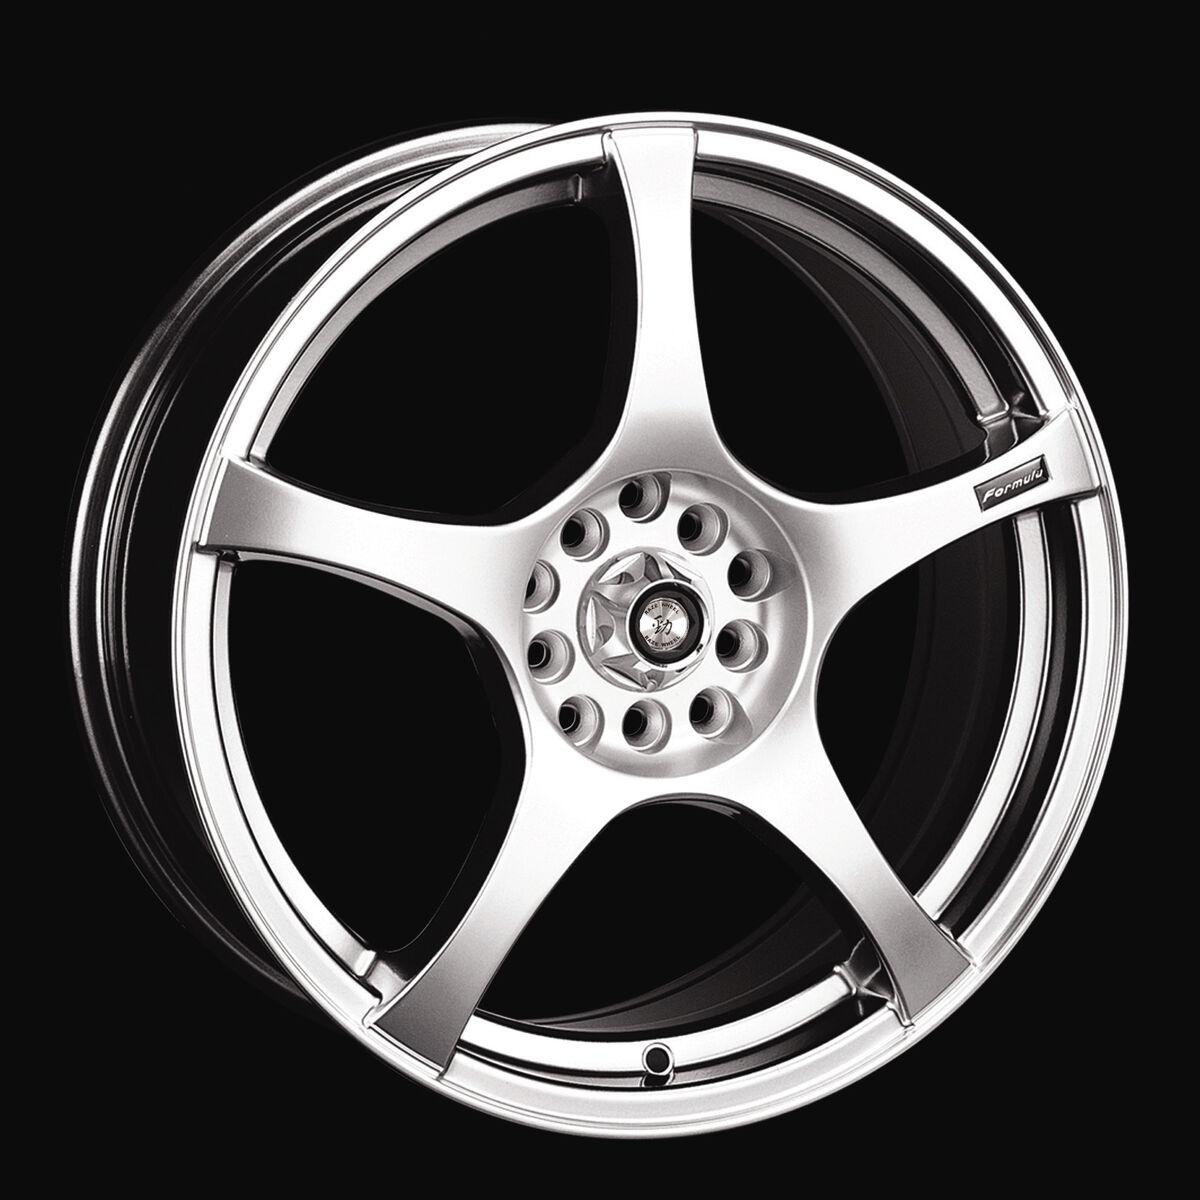 19 Raze R40 Wheels Rims Honda Accord Civic CRX Integra 4x100 4x114 3